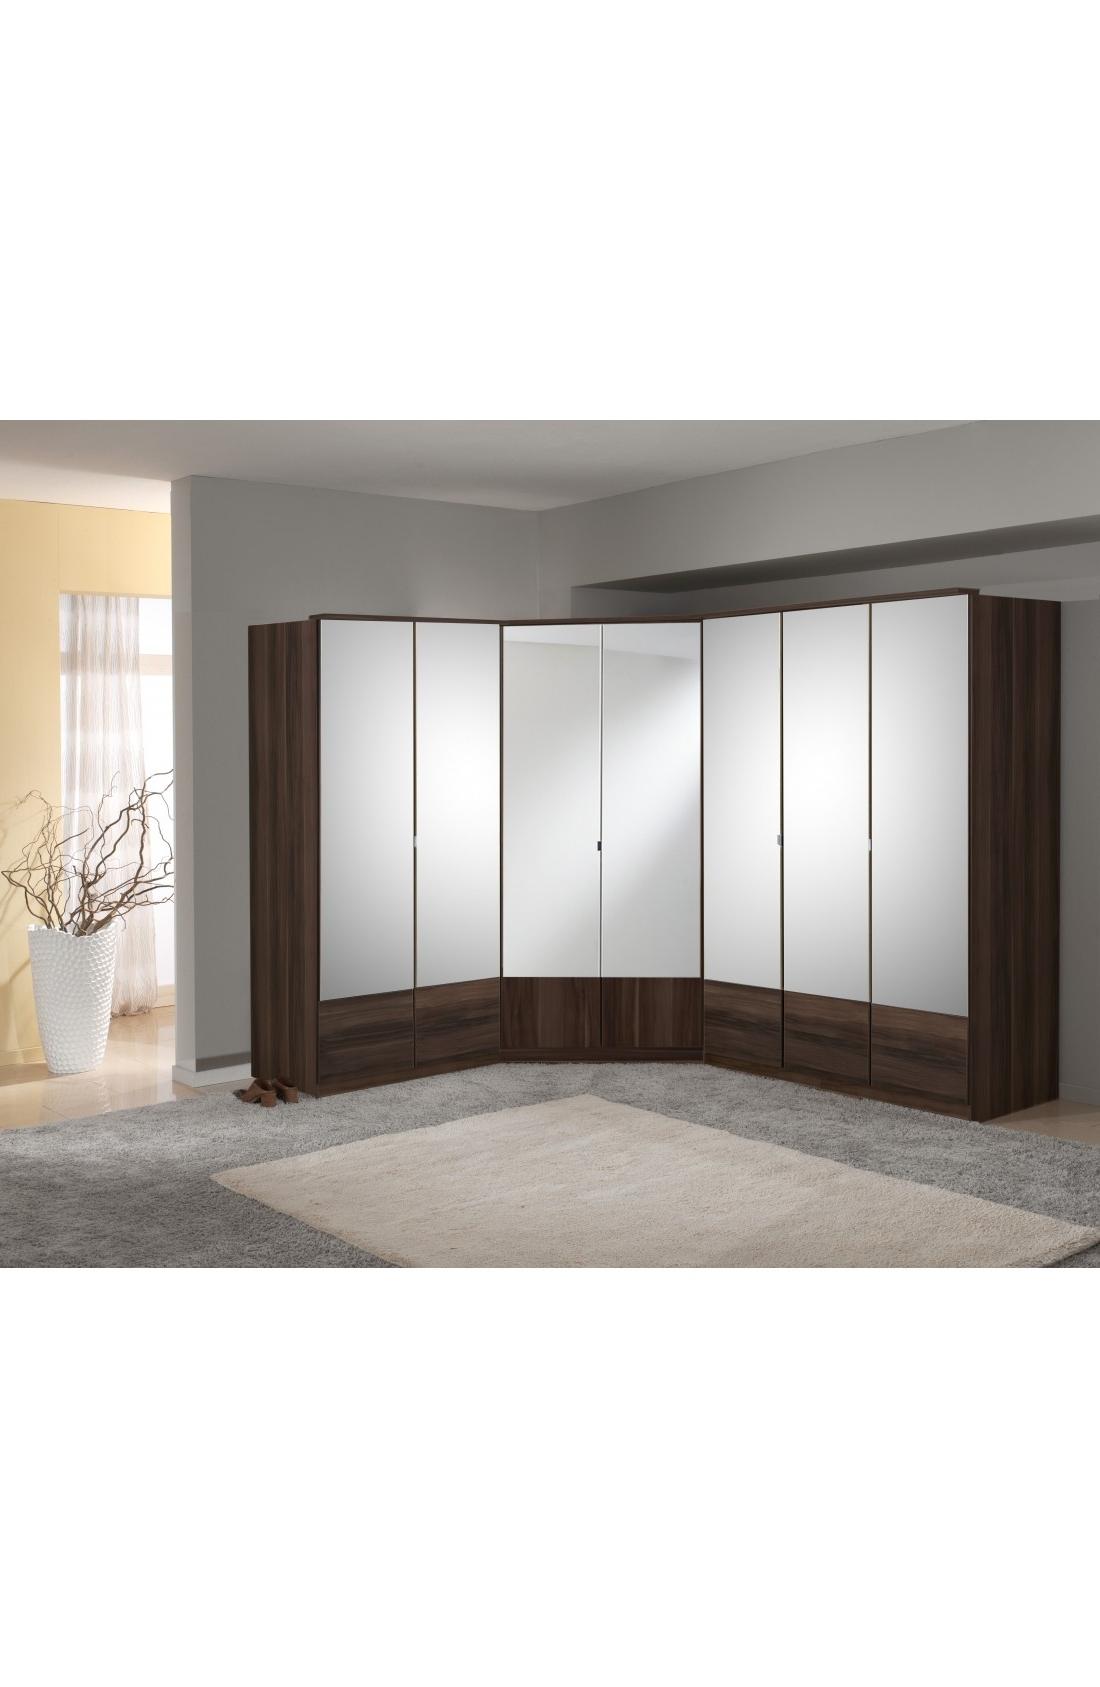 Slumberhaus 'imago' 7 Door Corner Wardrobe Fitment With Walnut And Within Best And Newest Corner Mirror Wardrobes (View 8 of 15)